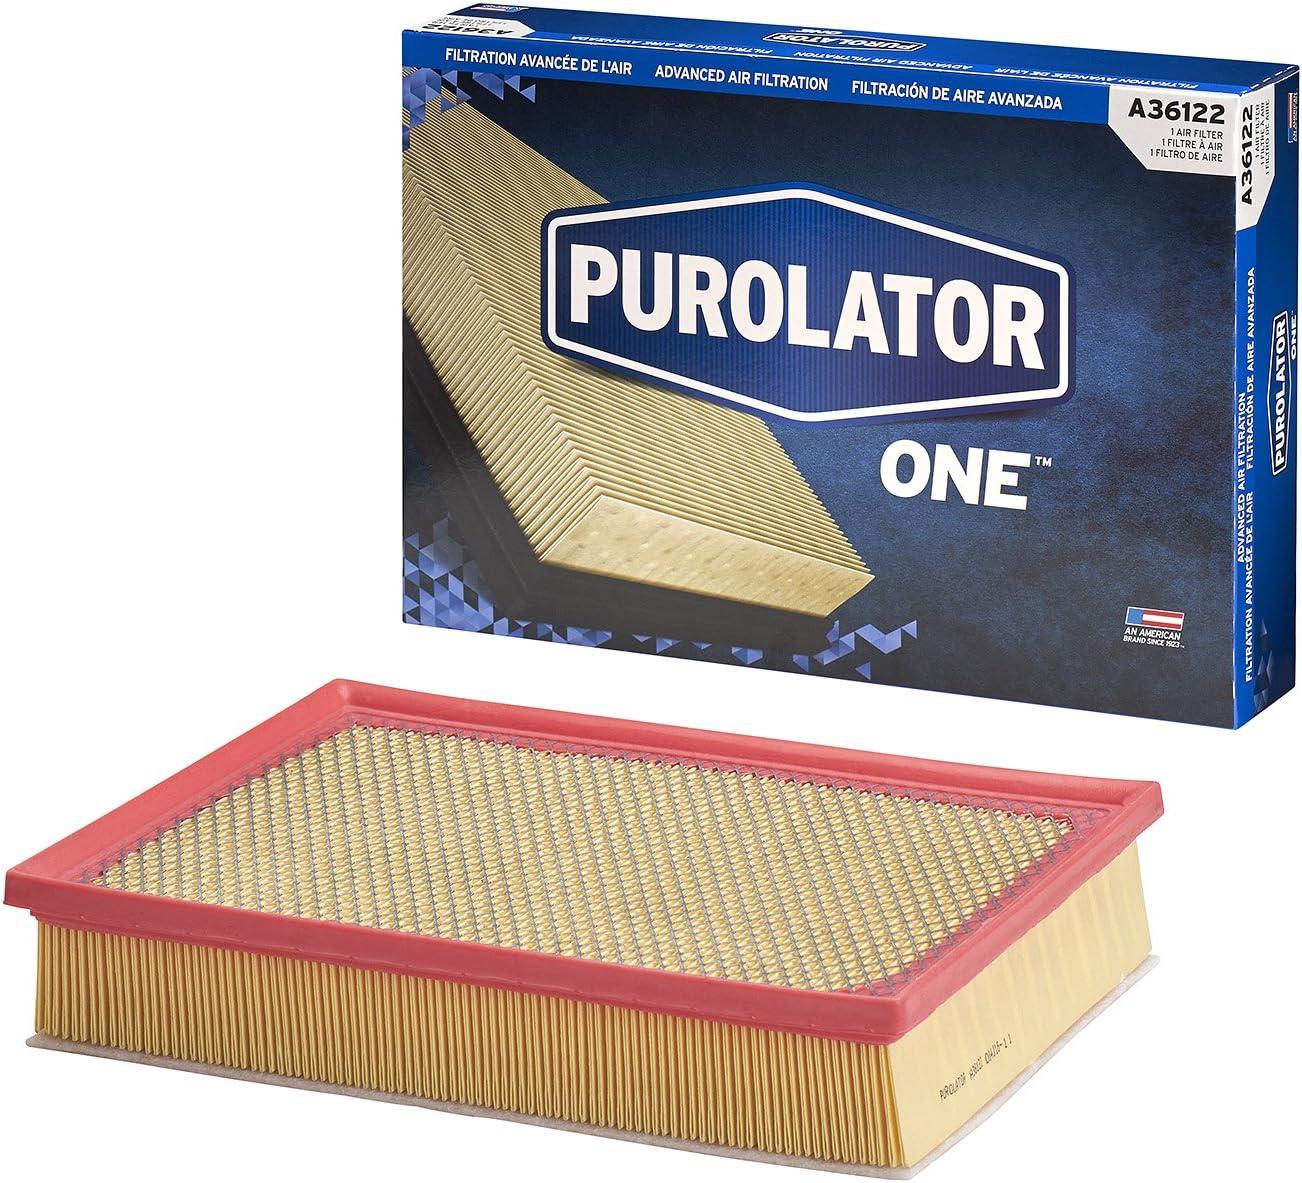 Purolator A36122 PurolatorONE Air Filter